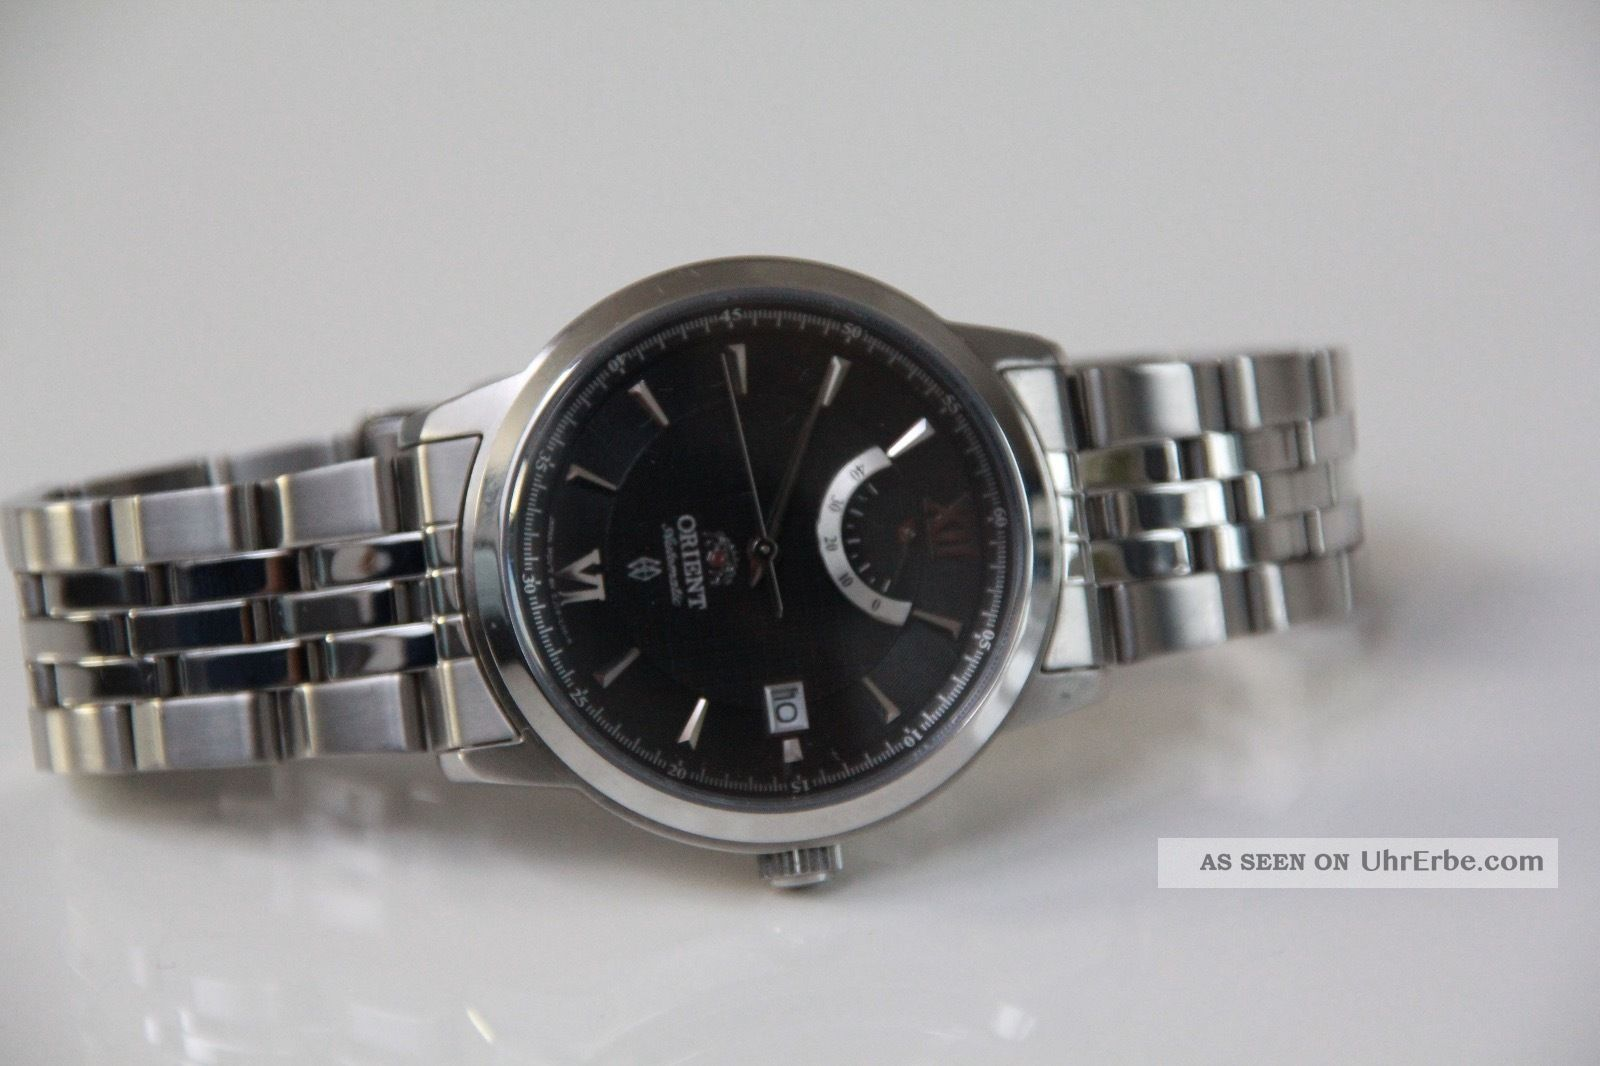 Orient Automatik Herren Armbanduhr Ej02 - Co - A Silber Mit Schwarzem Zifferblatt Armbanduhren Bild